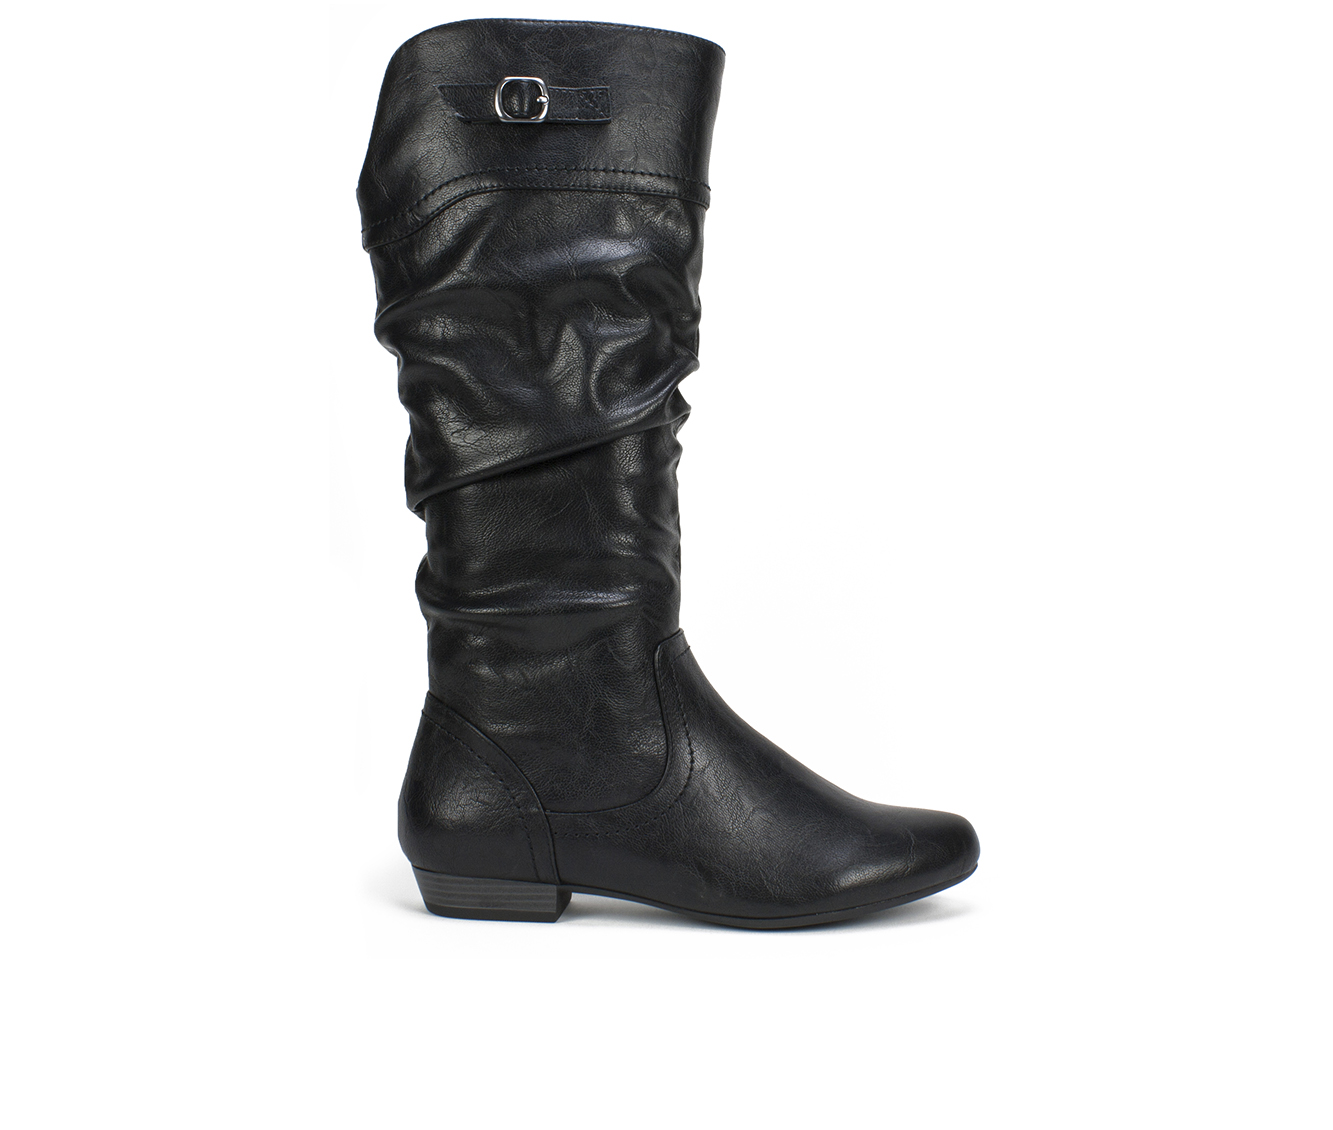 Cliffs Fox Women's Boot (Black Faux Leather)